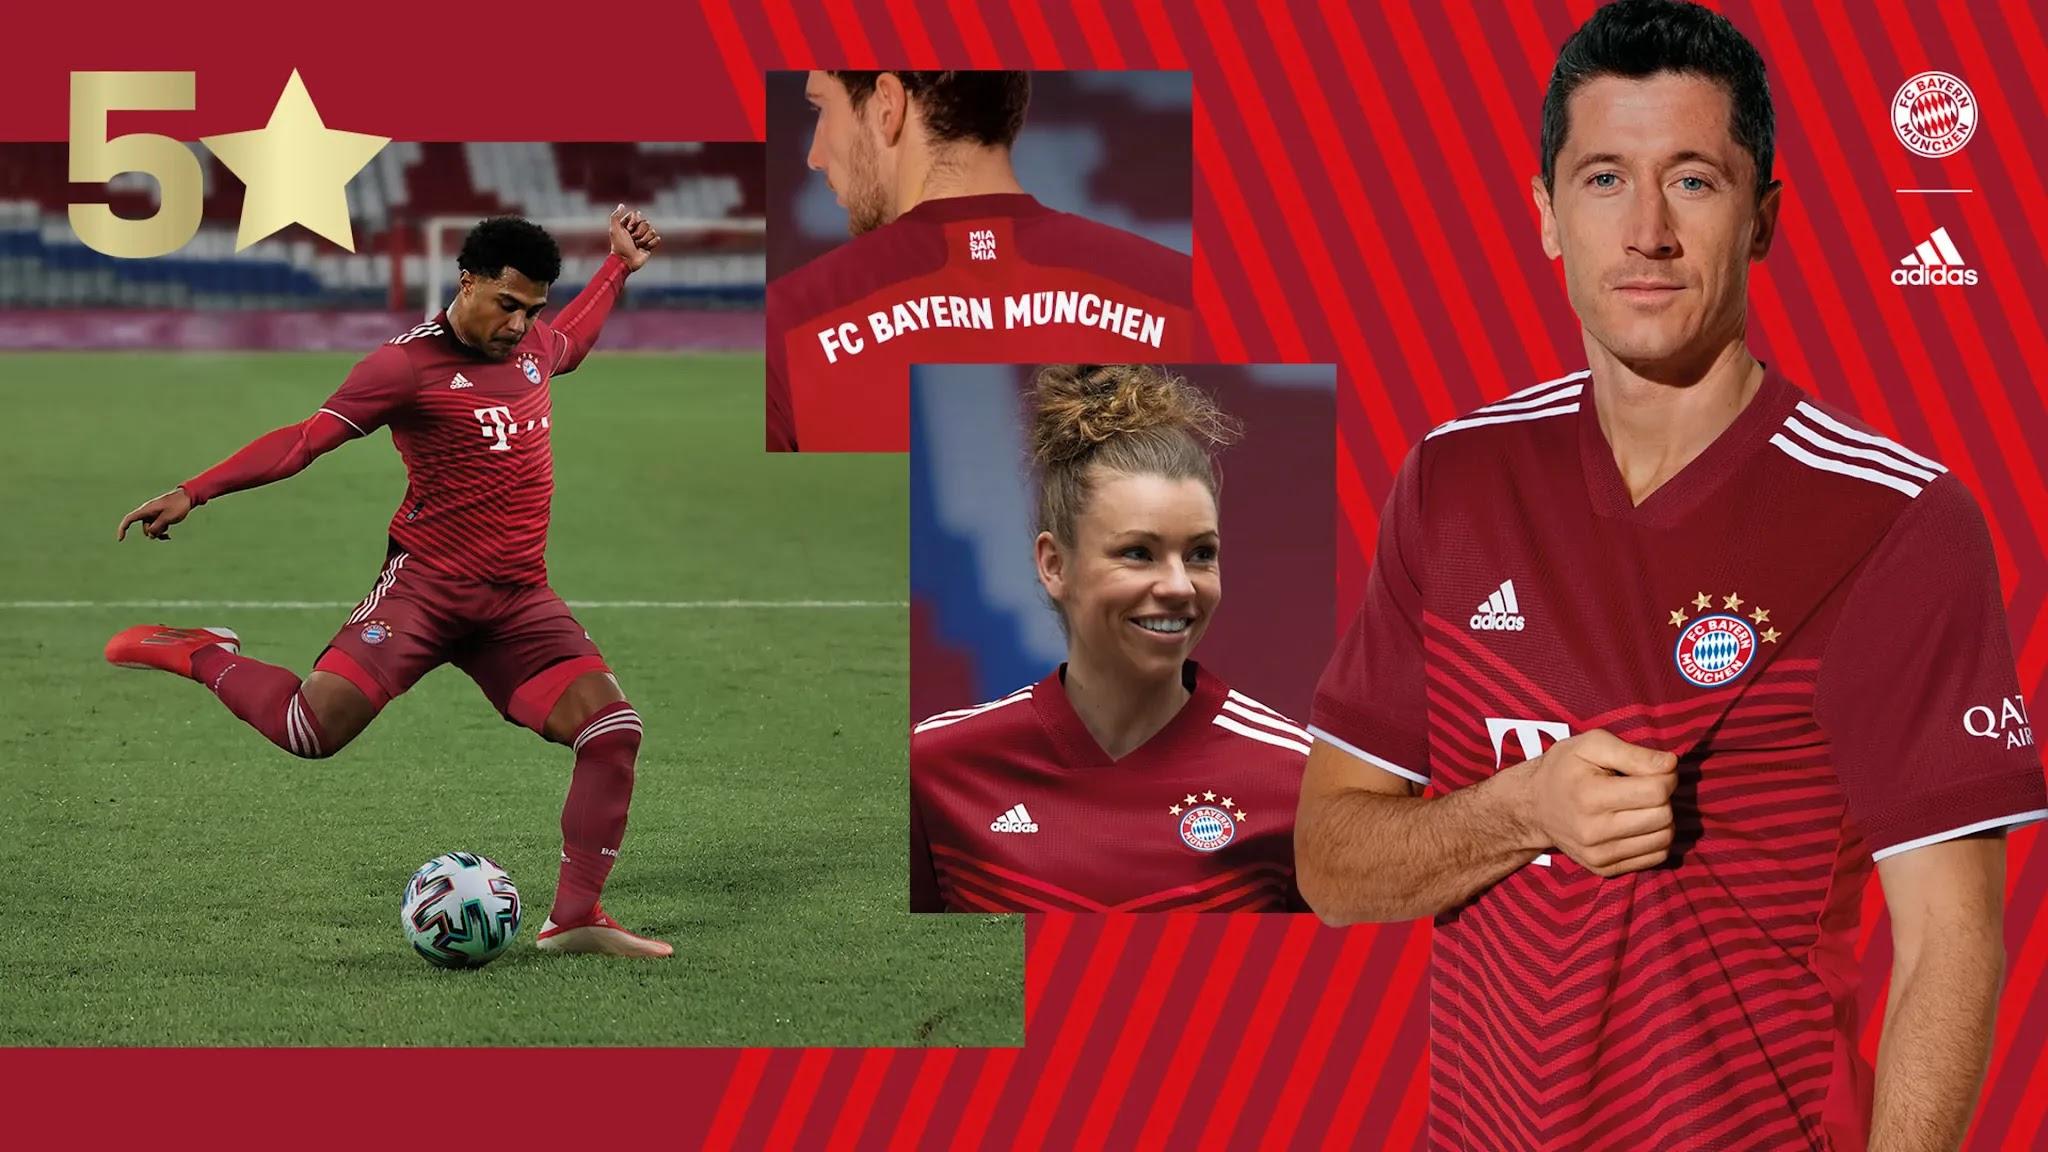 bayern-munich-2021-2022-kits-and-logo-dream-league-soccer-2021-kits